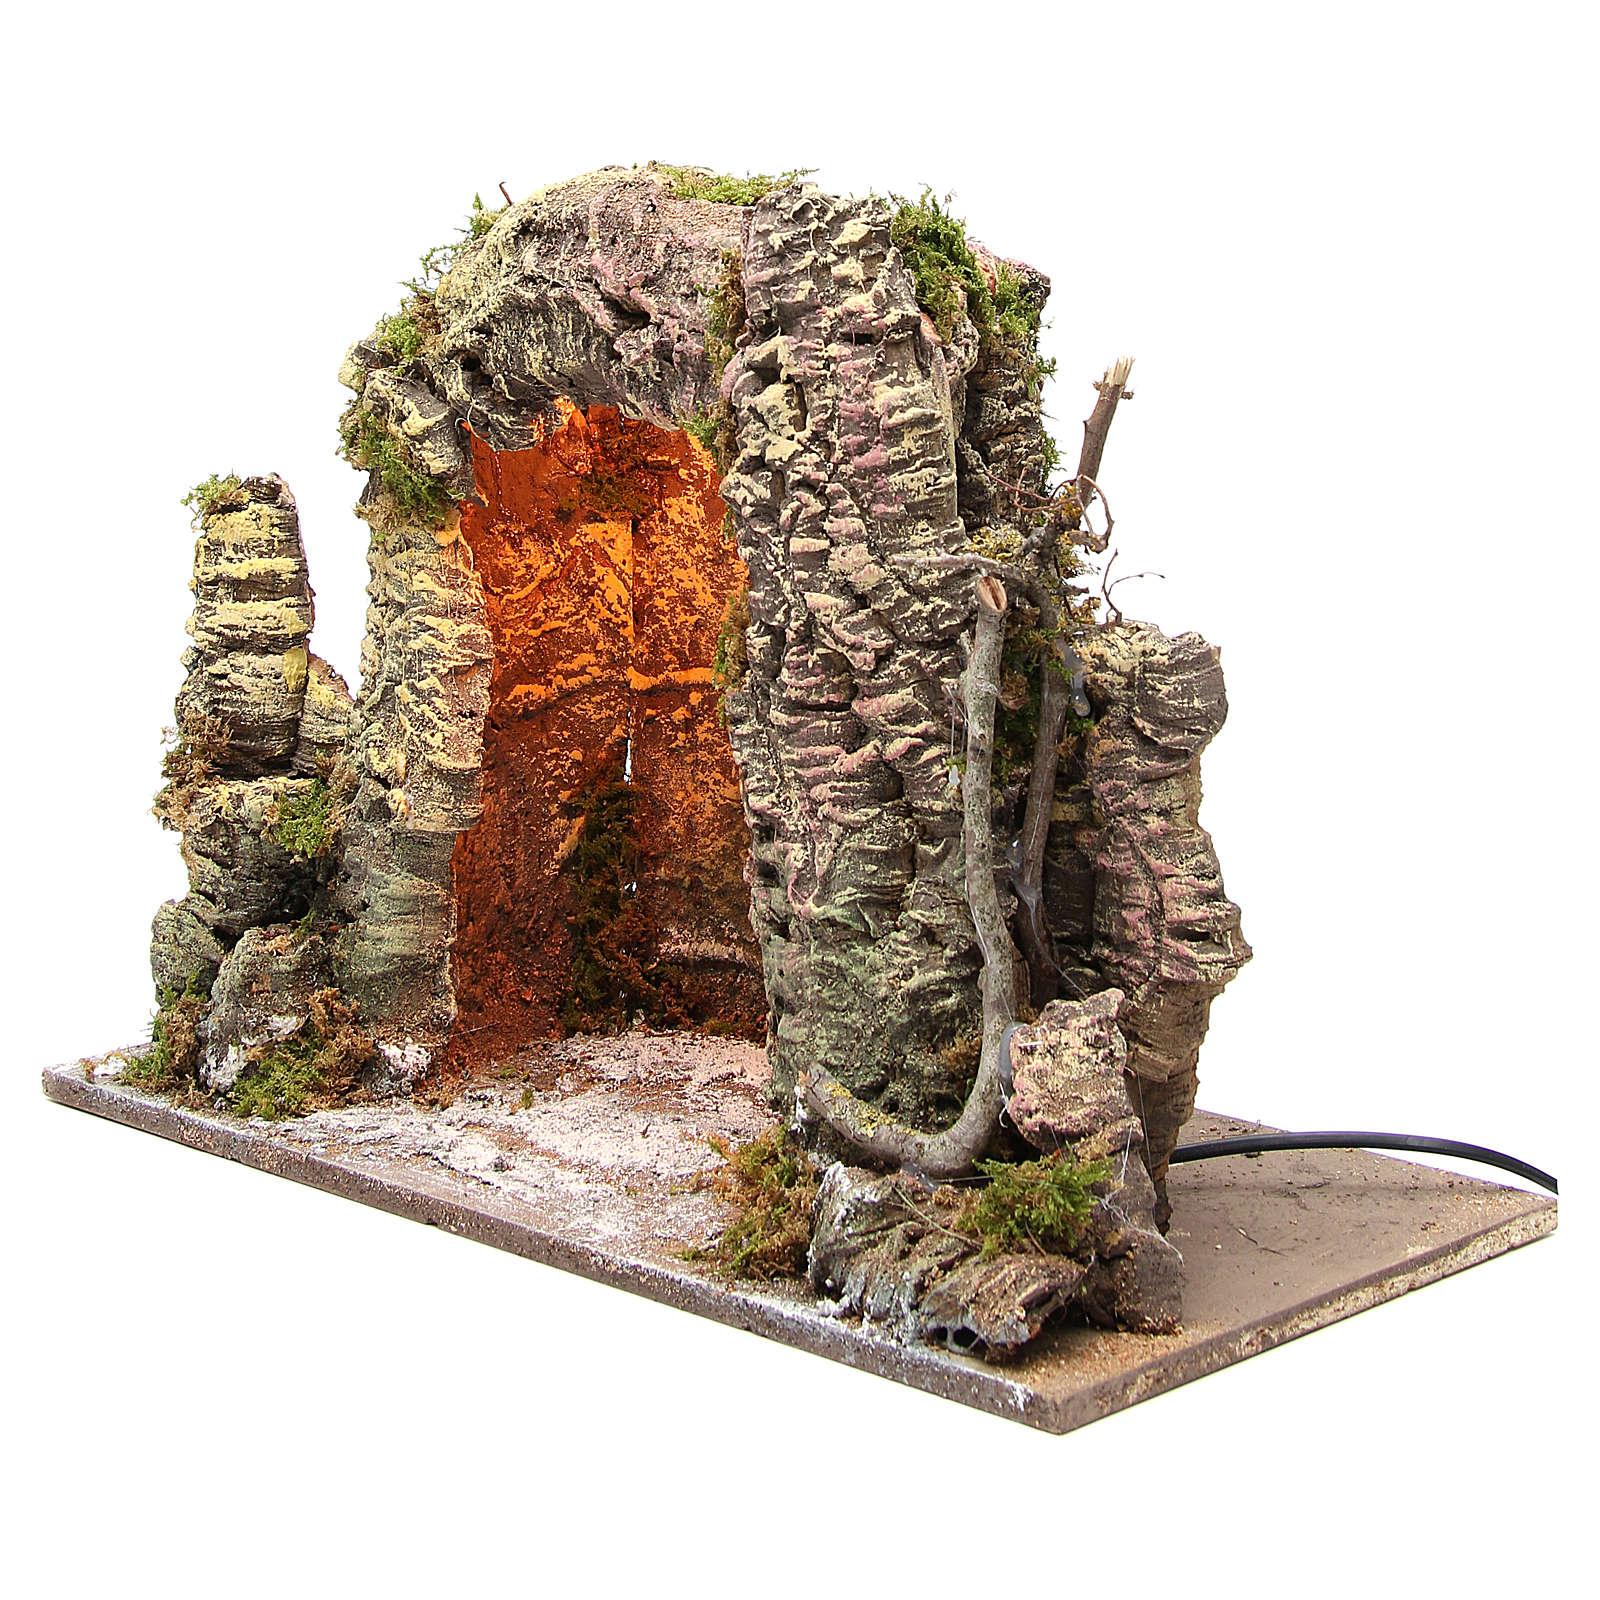 Grotta presepe illuminata 35x50x26 cm 4